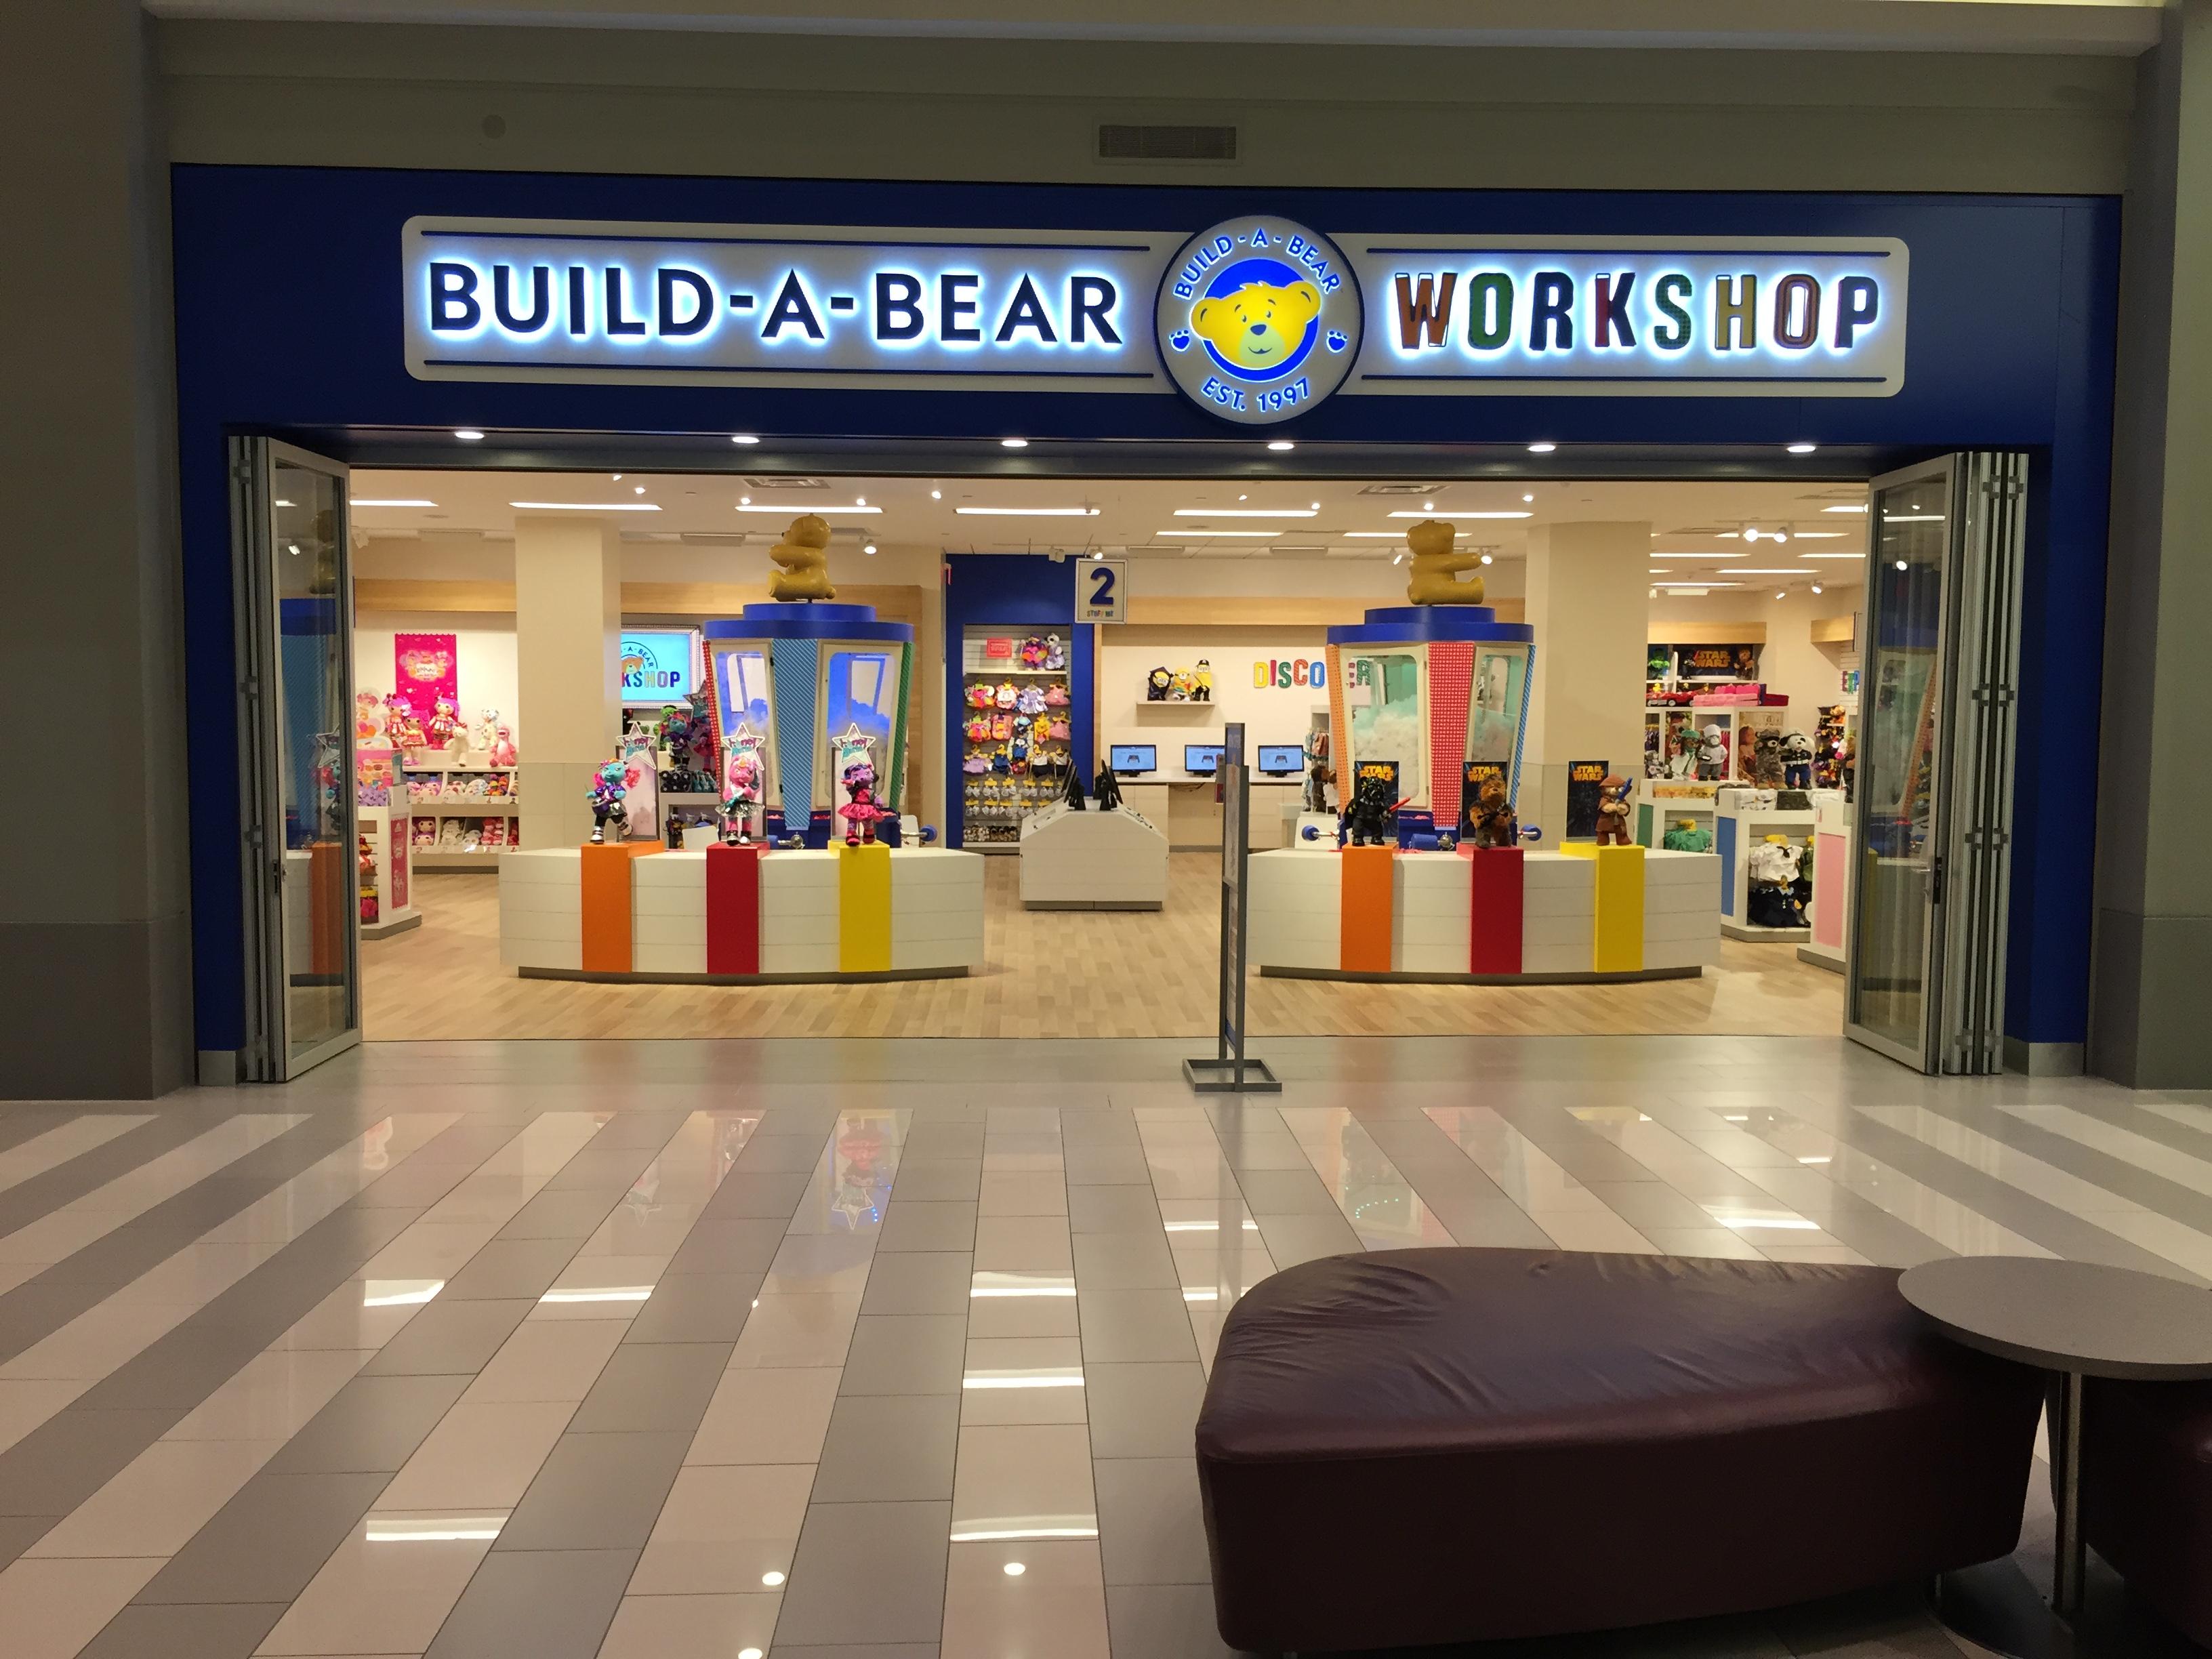 Build-A-Bear Workshop (Mall of America)